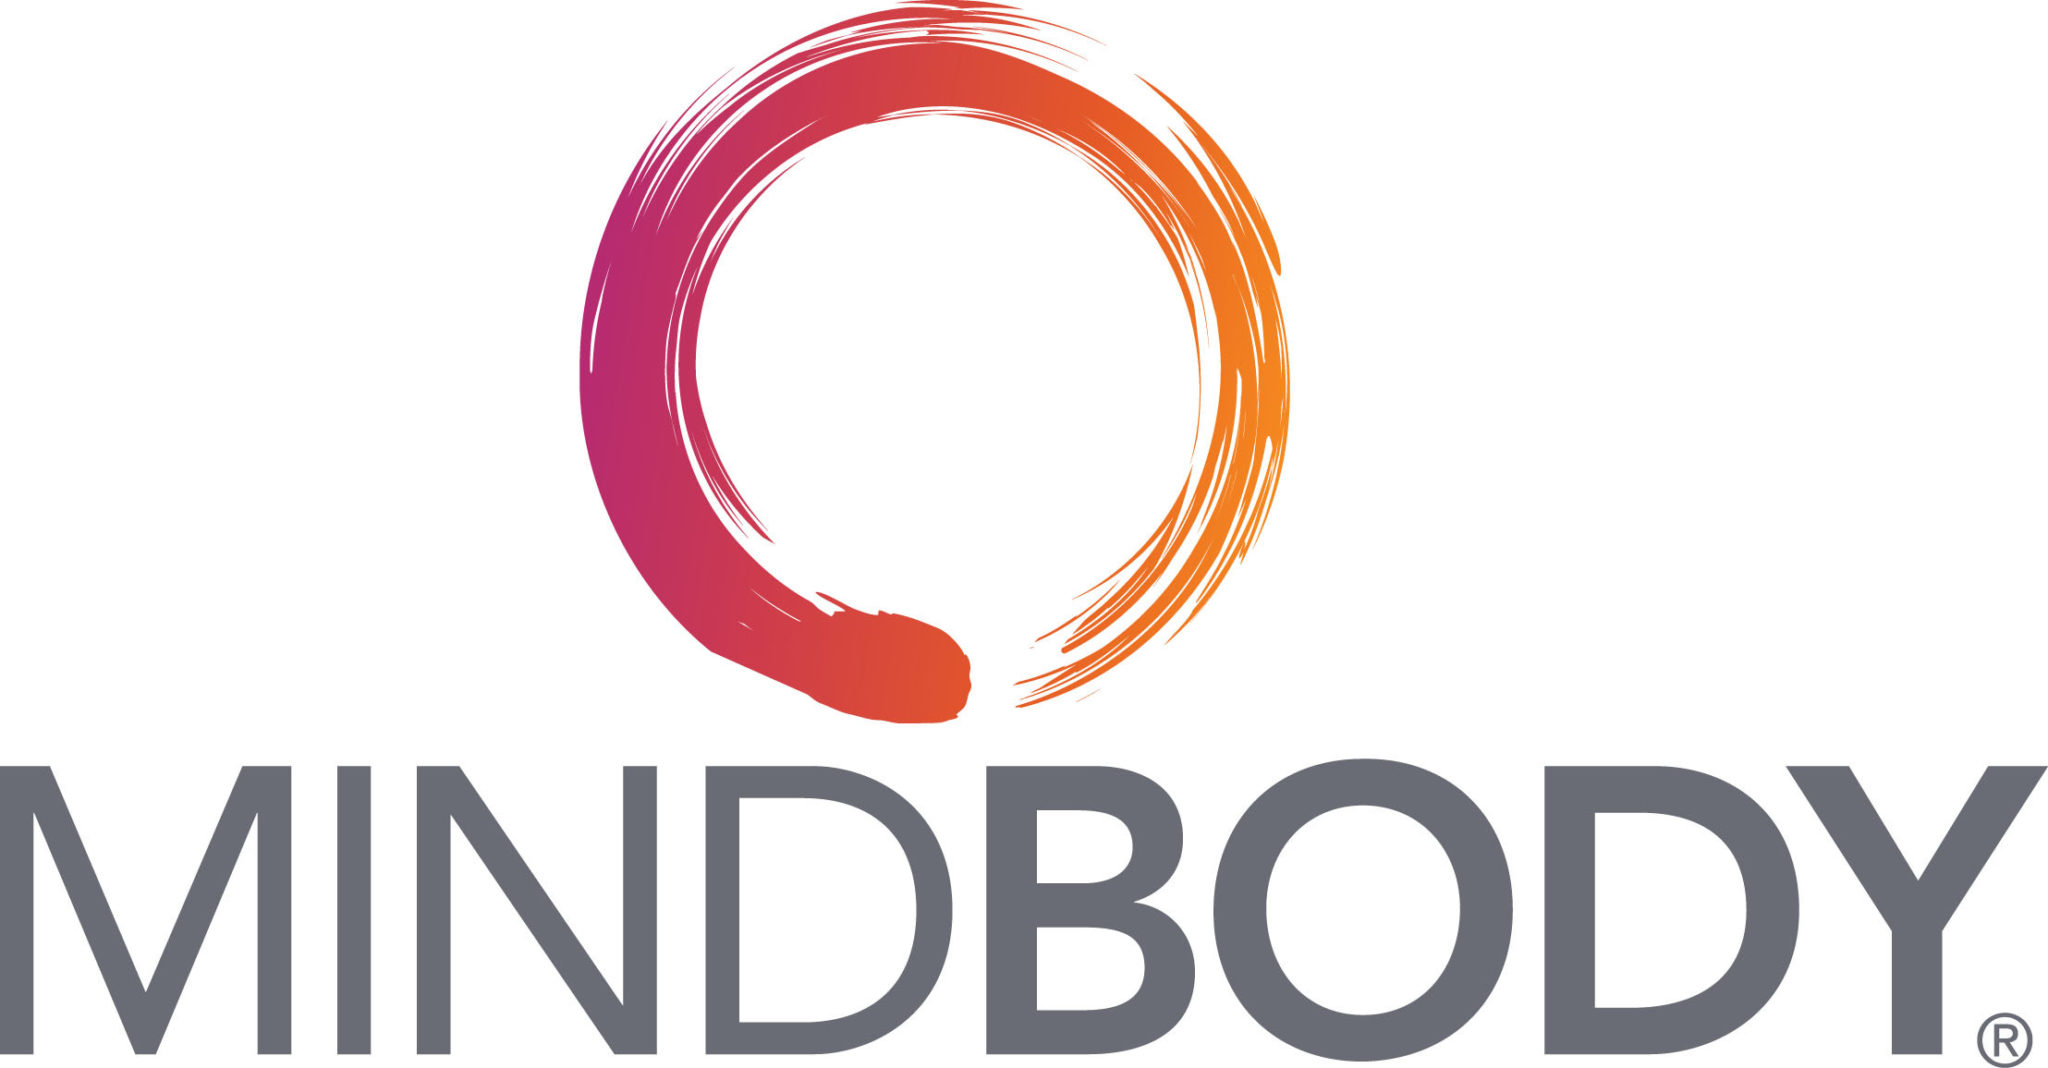 MINDBODY logo smb sales specialist